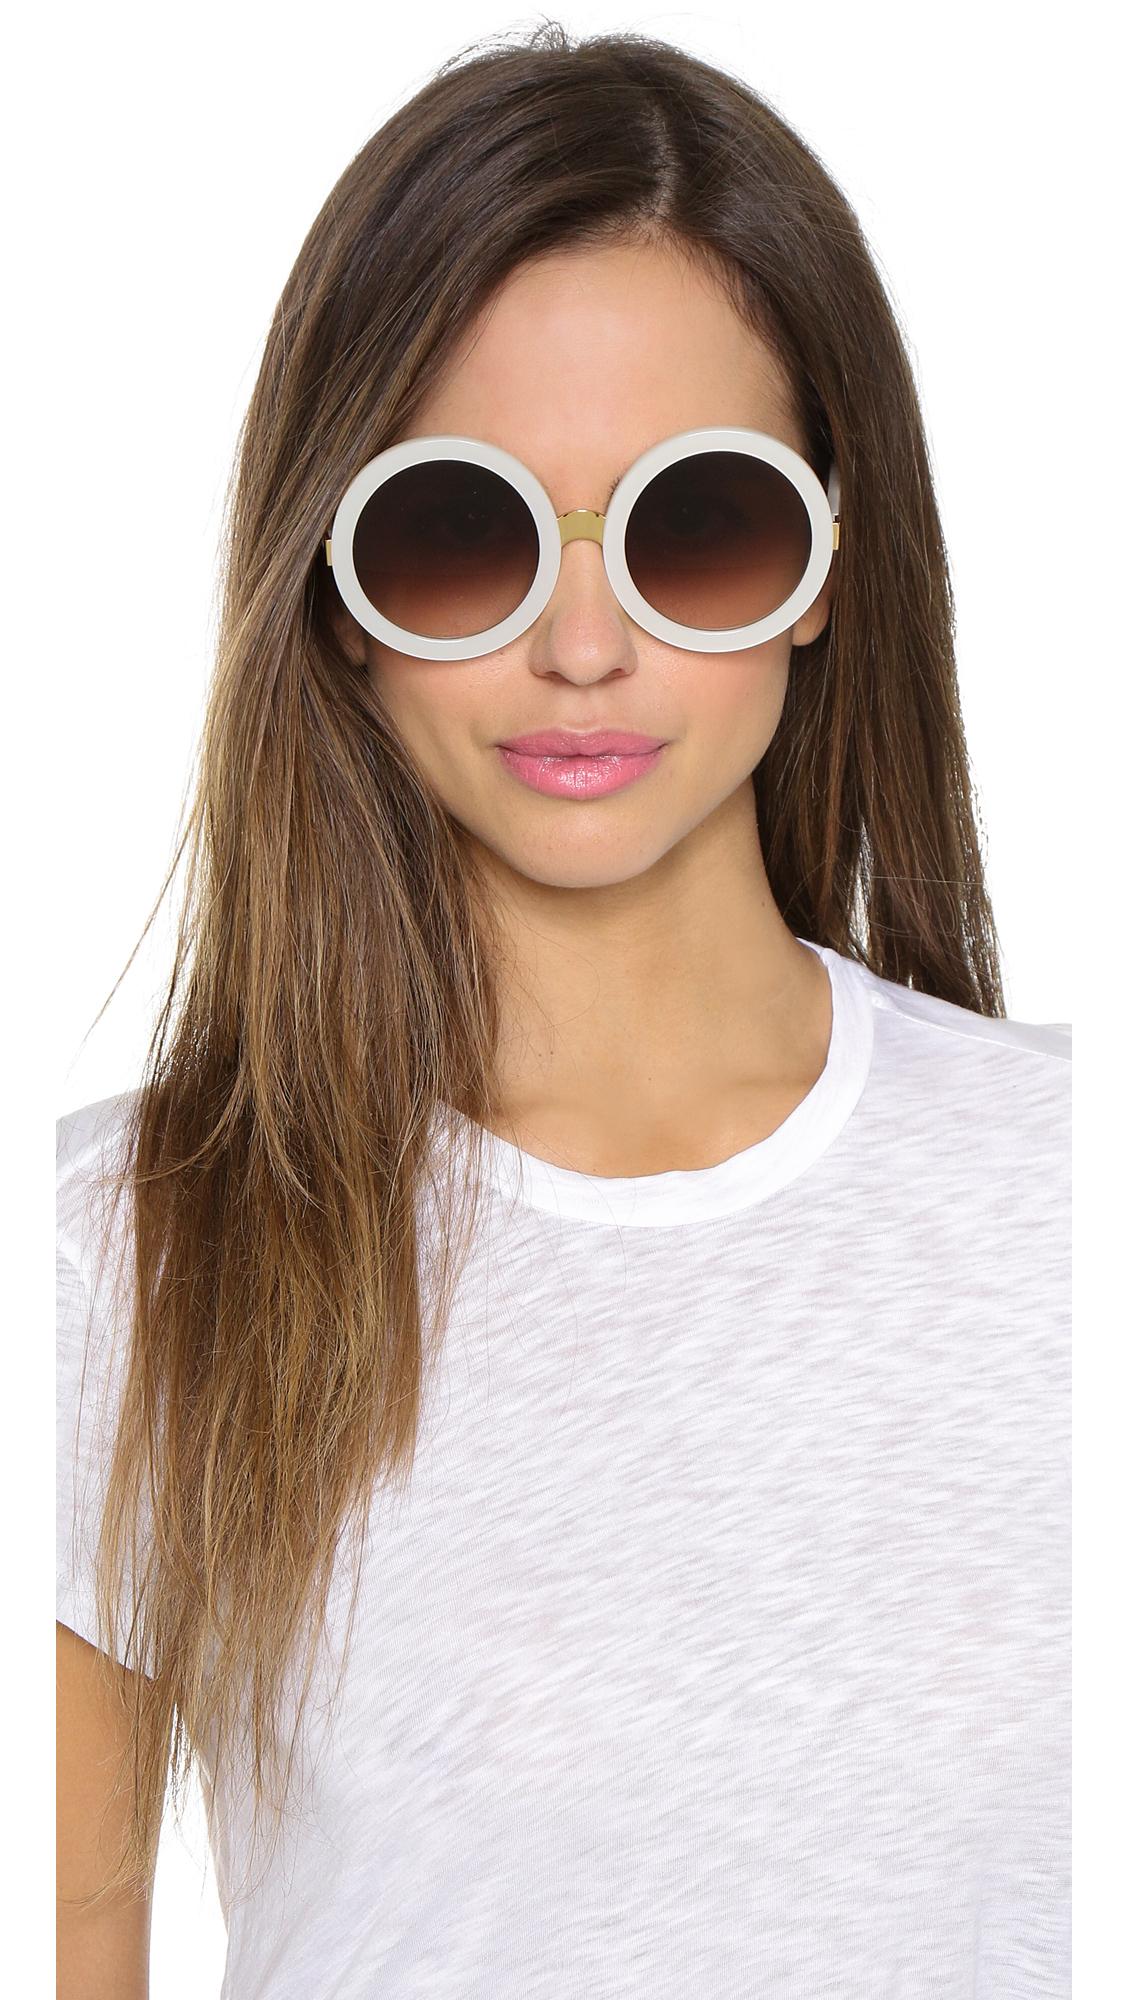 f42f5f9dc9 Wildfox Malibu Sunglasses - Amber Tortoise brown Sun in White - Lyst